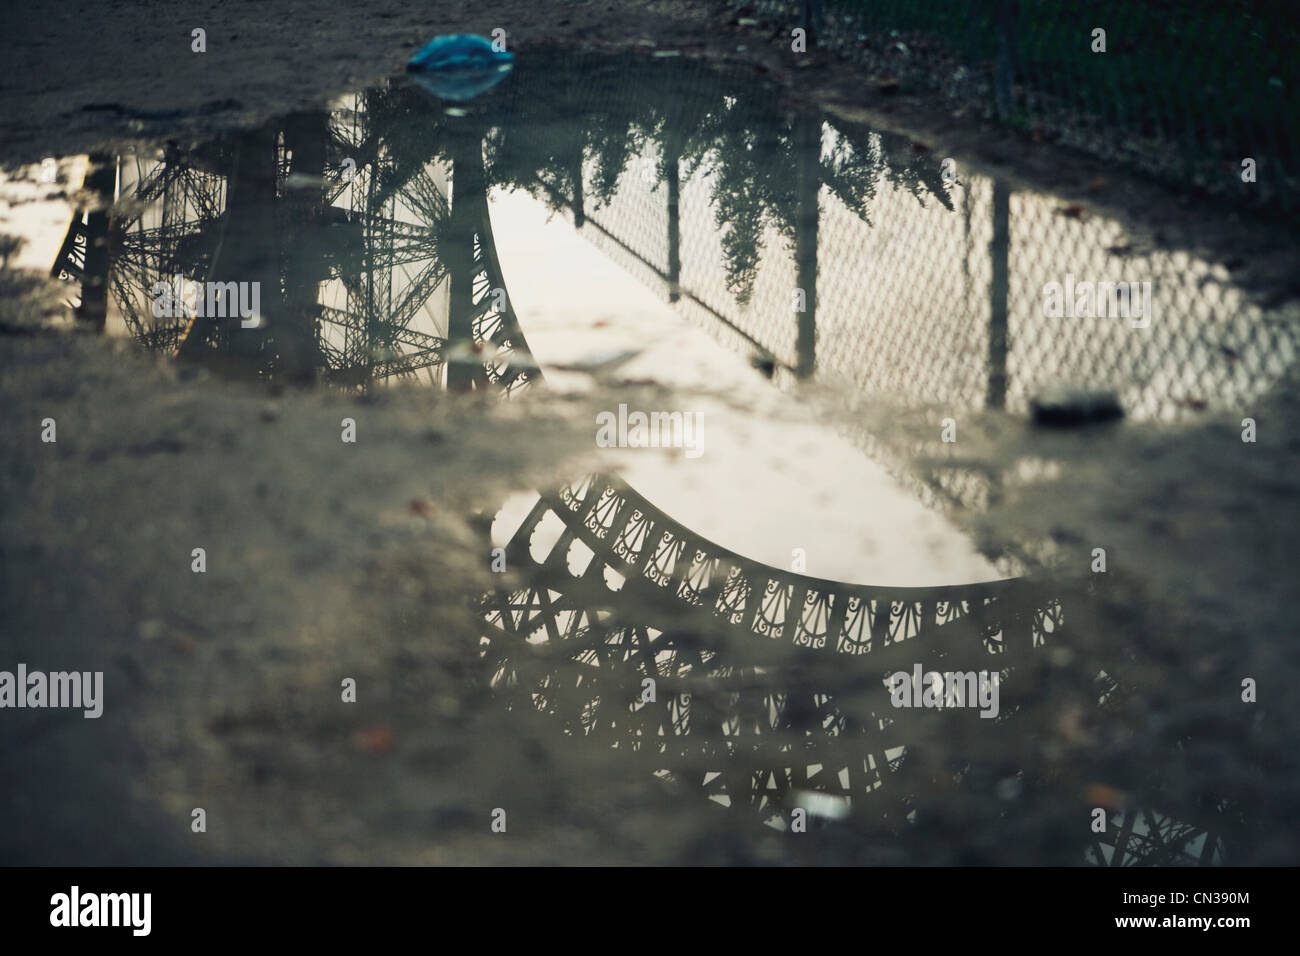 La Tour Eiffel compte in puddle Photo Stock